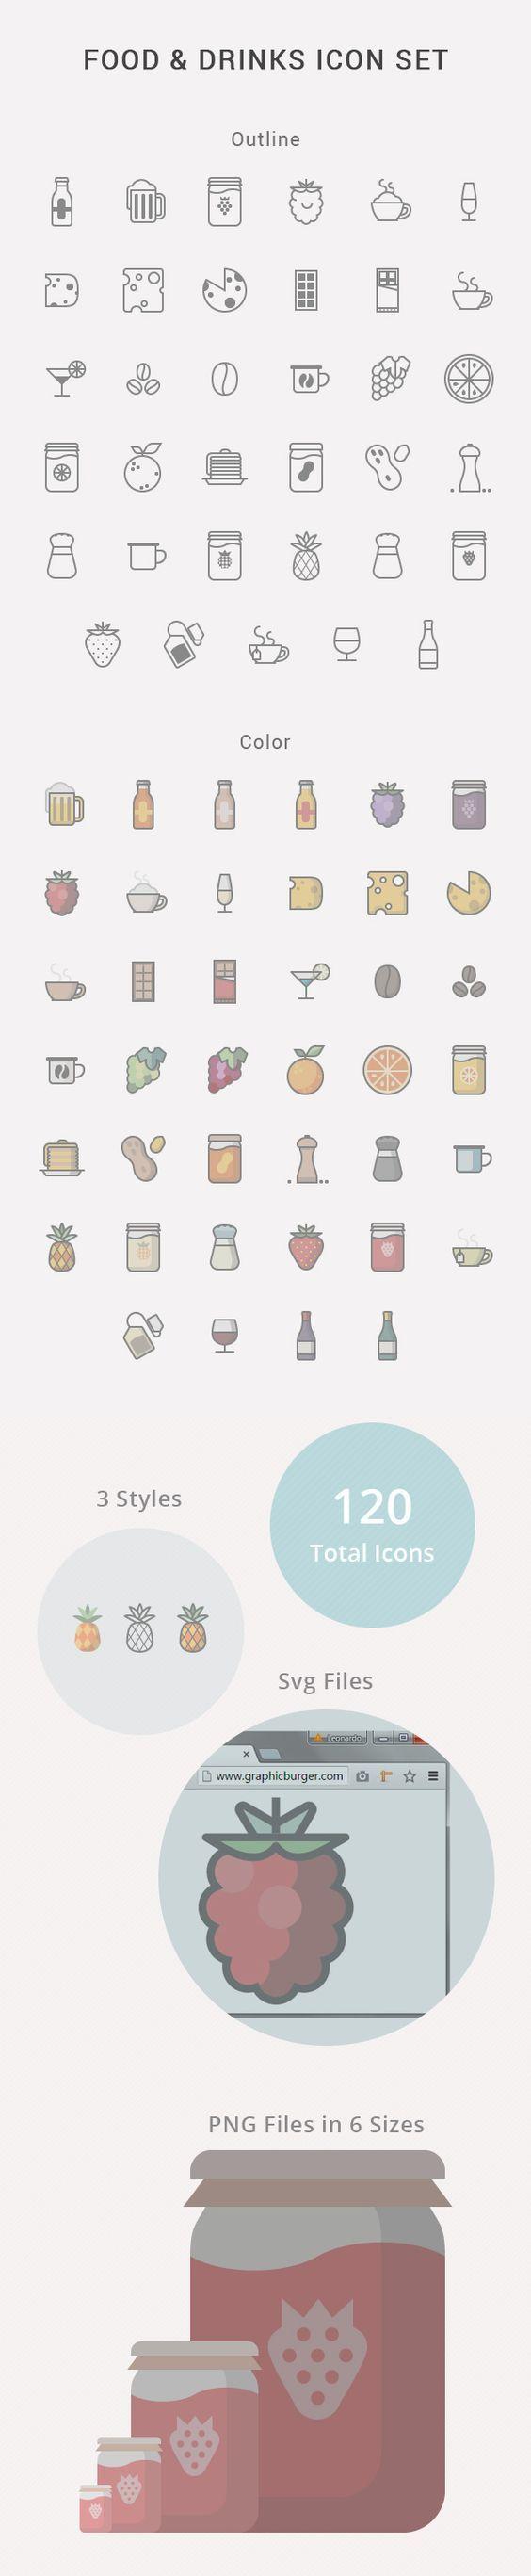 Food & Drinks Icon Set